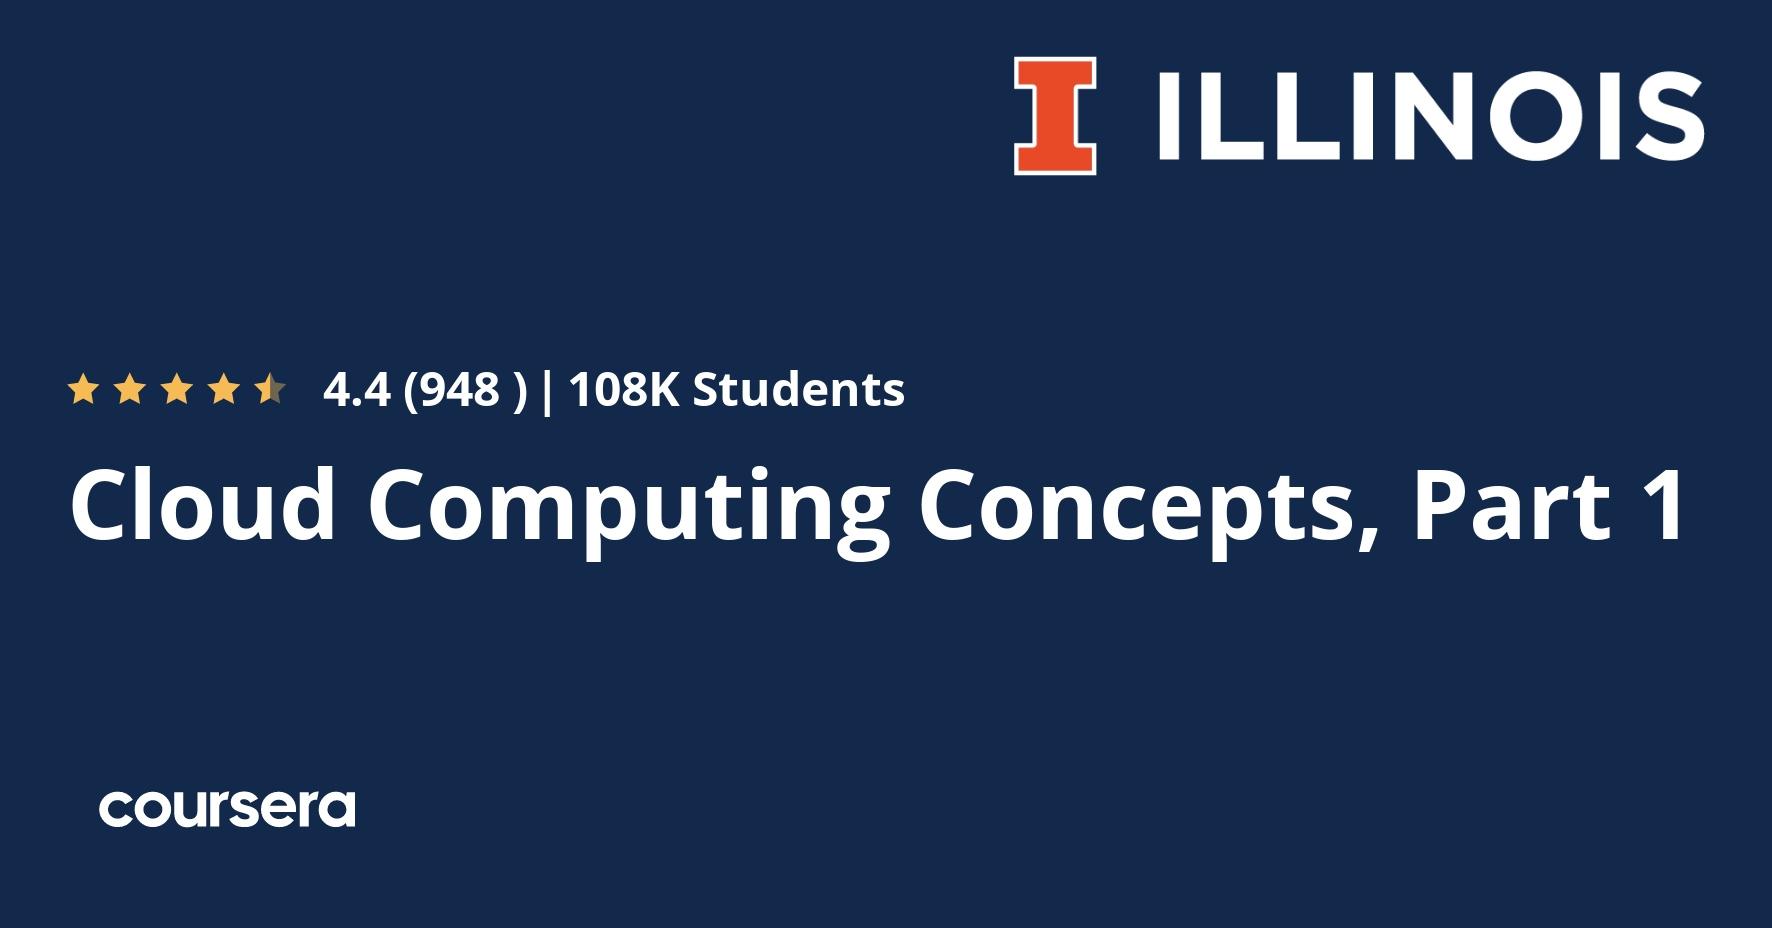 Cloud Computing Concepts Part 1  Coursera regarding Netball Certificate Templates Free 17 Concepts